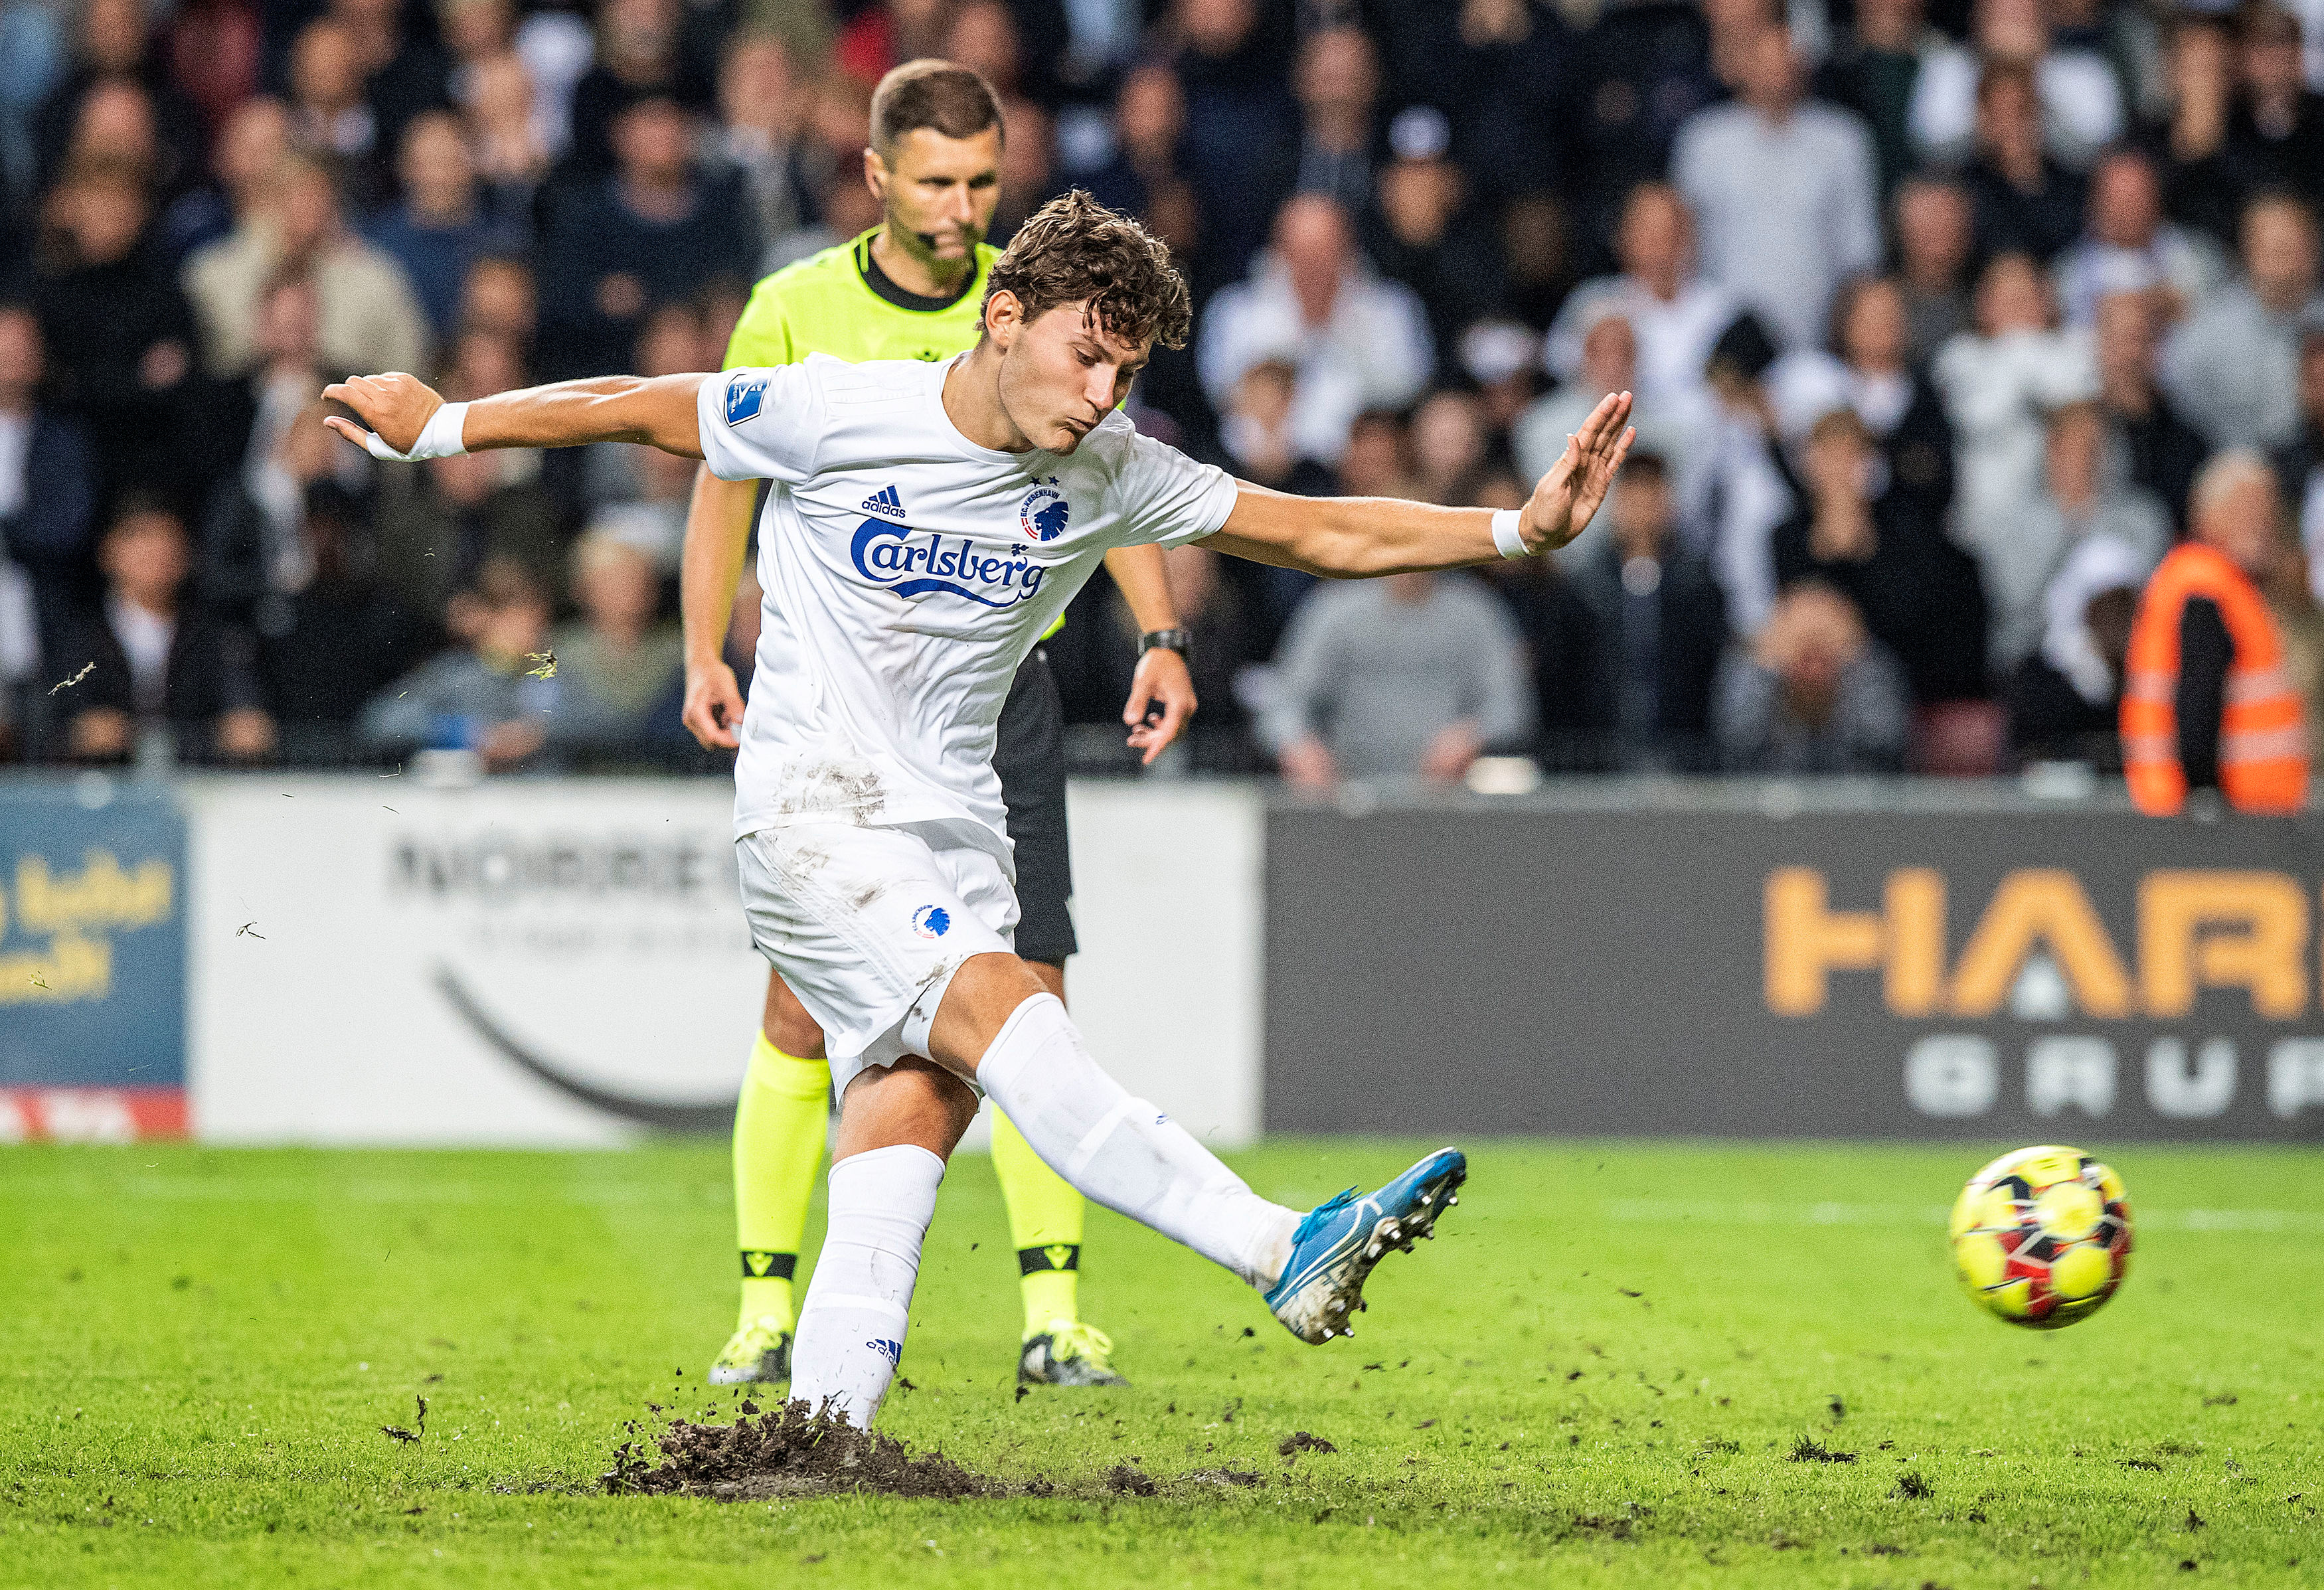 Champions League: Με 22 πέναλτι αποκλείστηκε η Κοπεγχάγη των Ζέκα – Σωτηρίου! [vid]